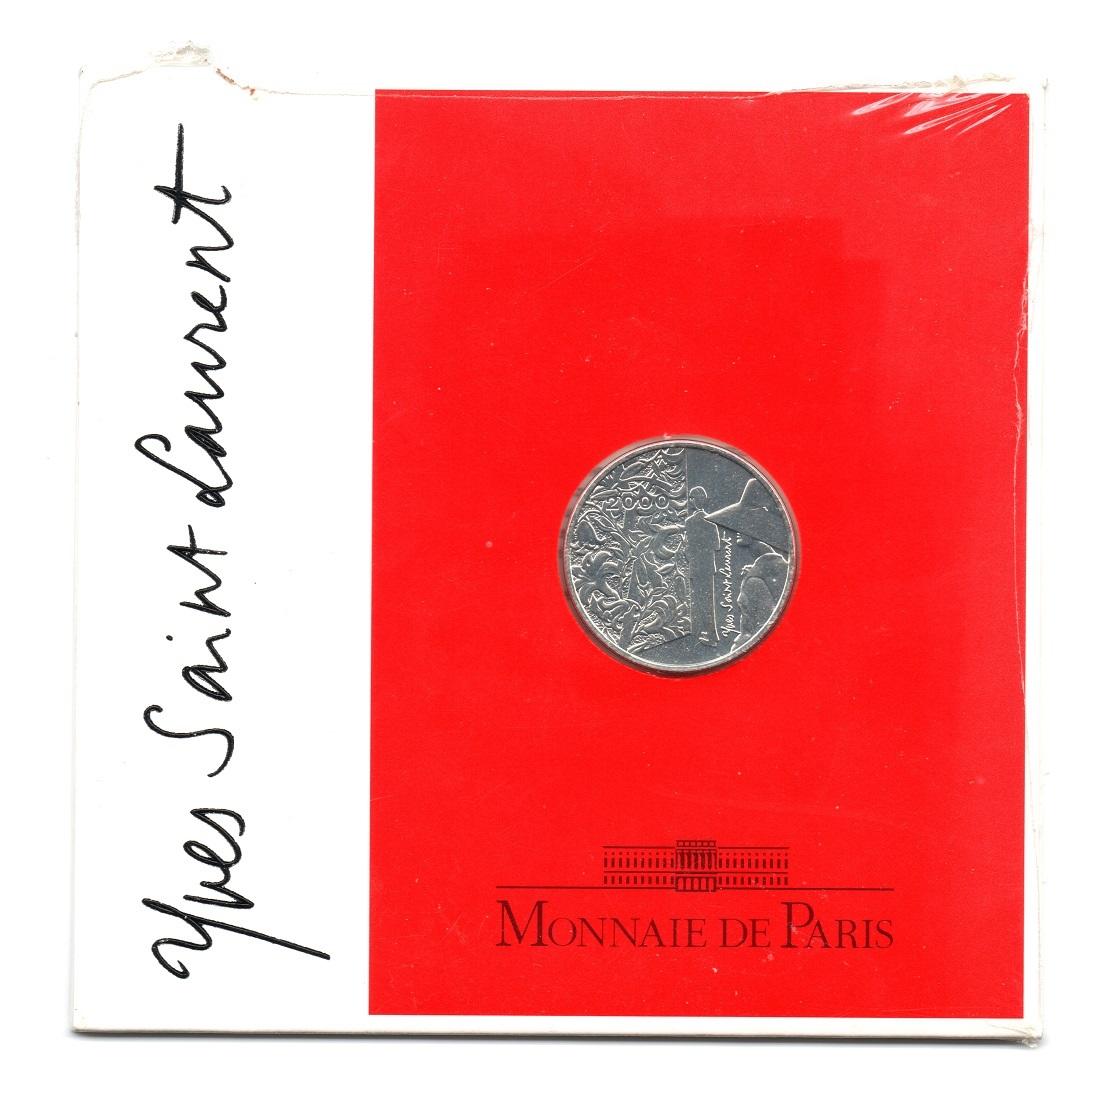 (FMO.5.2000.BUBE_.COM1_.10.000000001) 5 Francs Yves Saint-Laurent 2000 - BU silver Front (zoom)